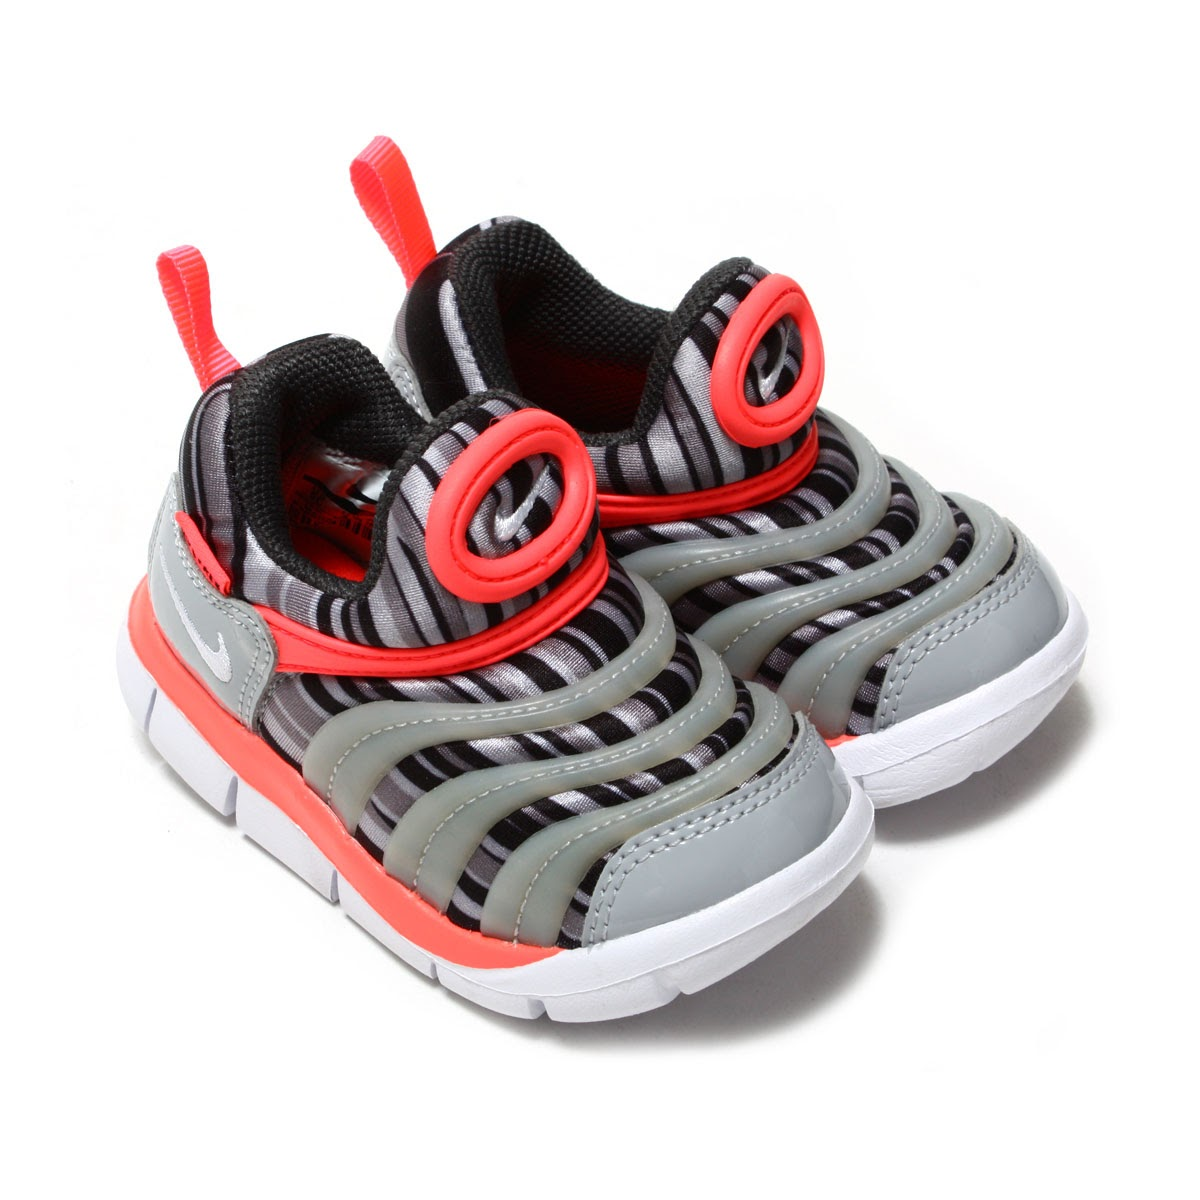 de0c2c87c0be2 NIKE DYNAMO FREE PRINT (TD) (Nike dynamo-free print TD)  ANTHRACITE WHITE-HOT PUNCH-WOLF GREY 17FA-I